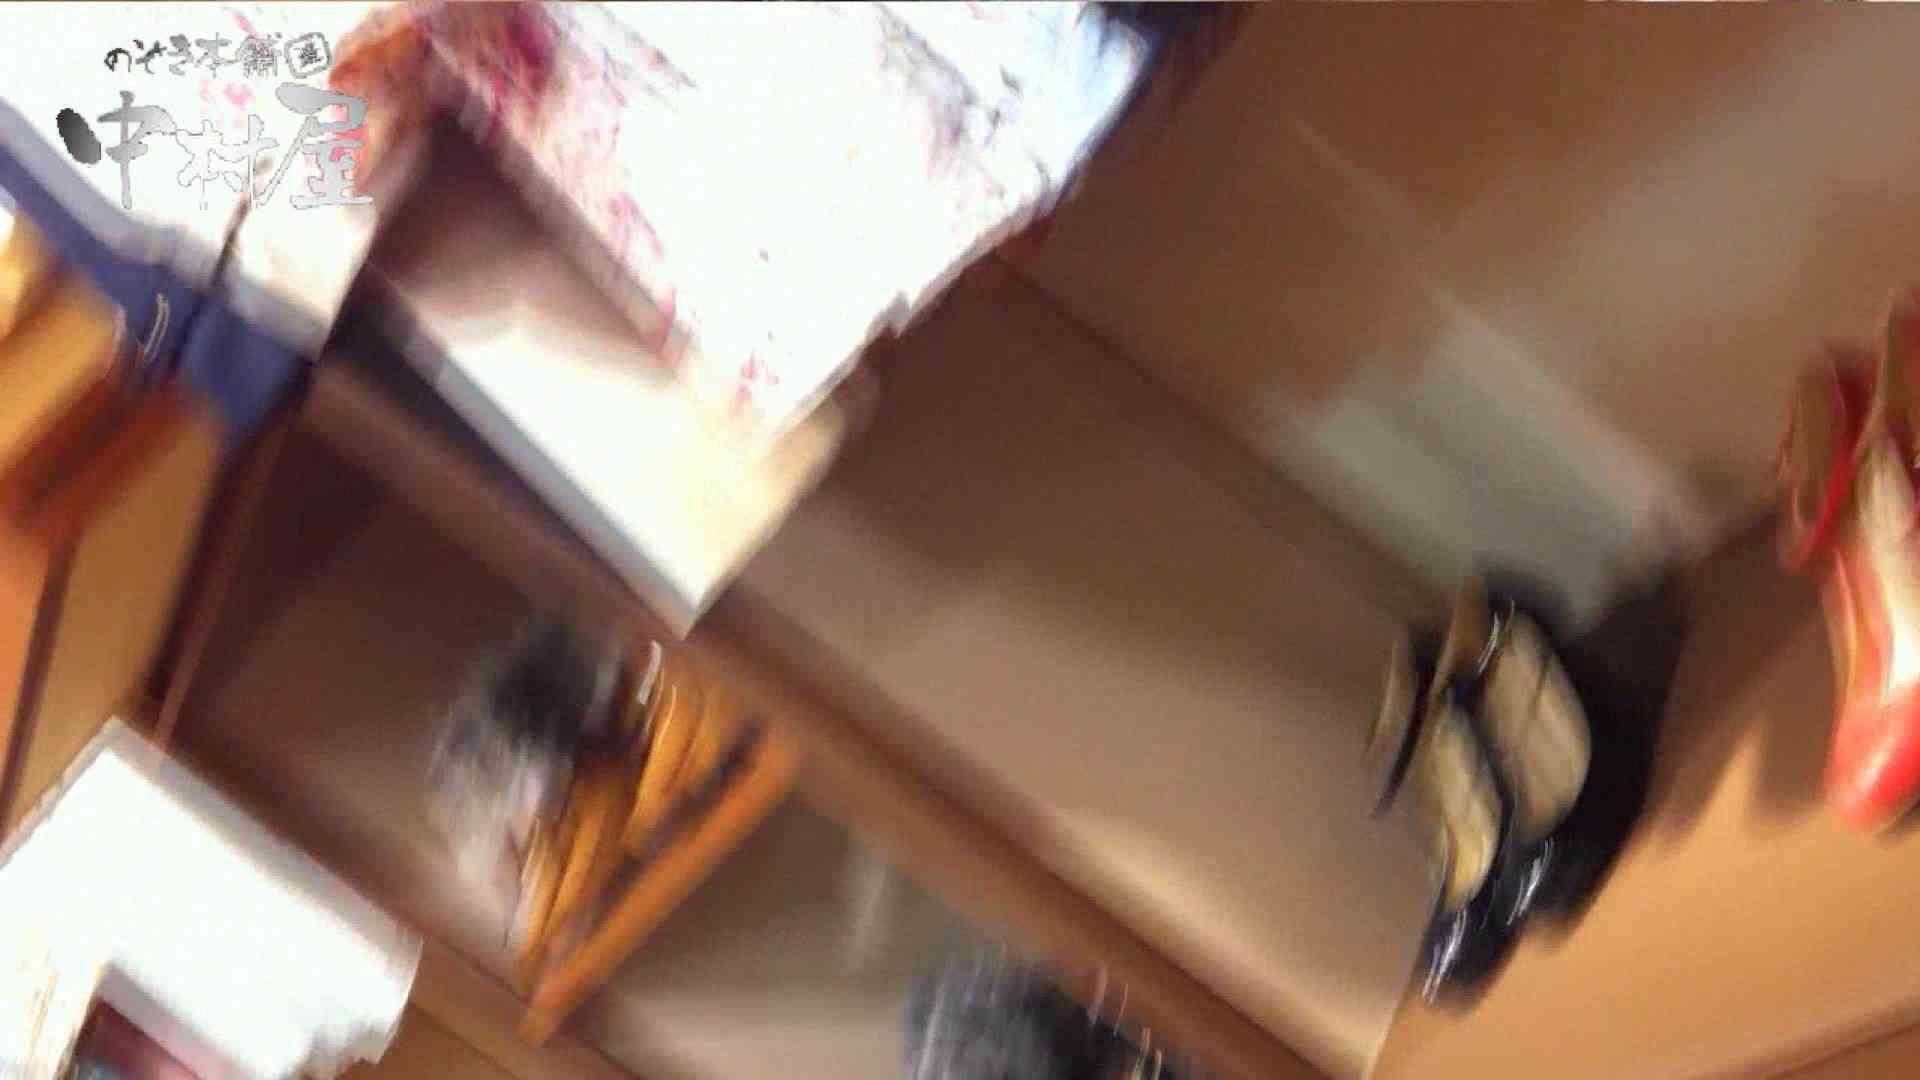 vol.57 美人アパレル胸チラ&パンチラ 激カワ店員のおっぱい チラ歓迎  99pic 96